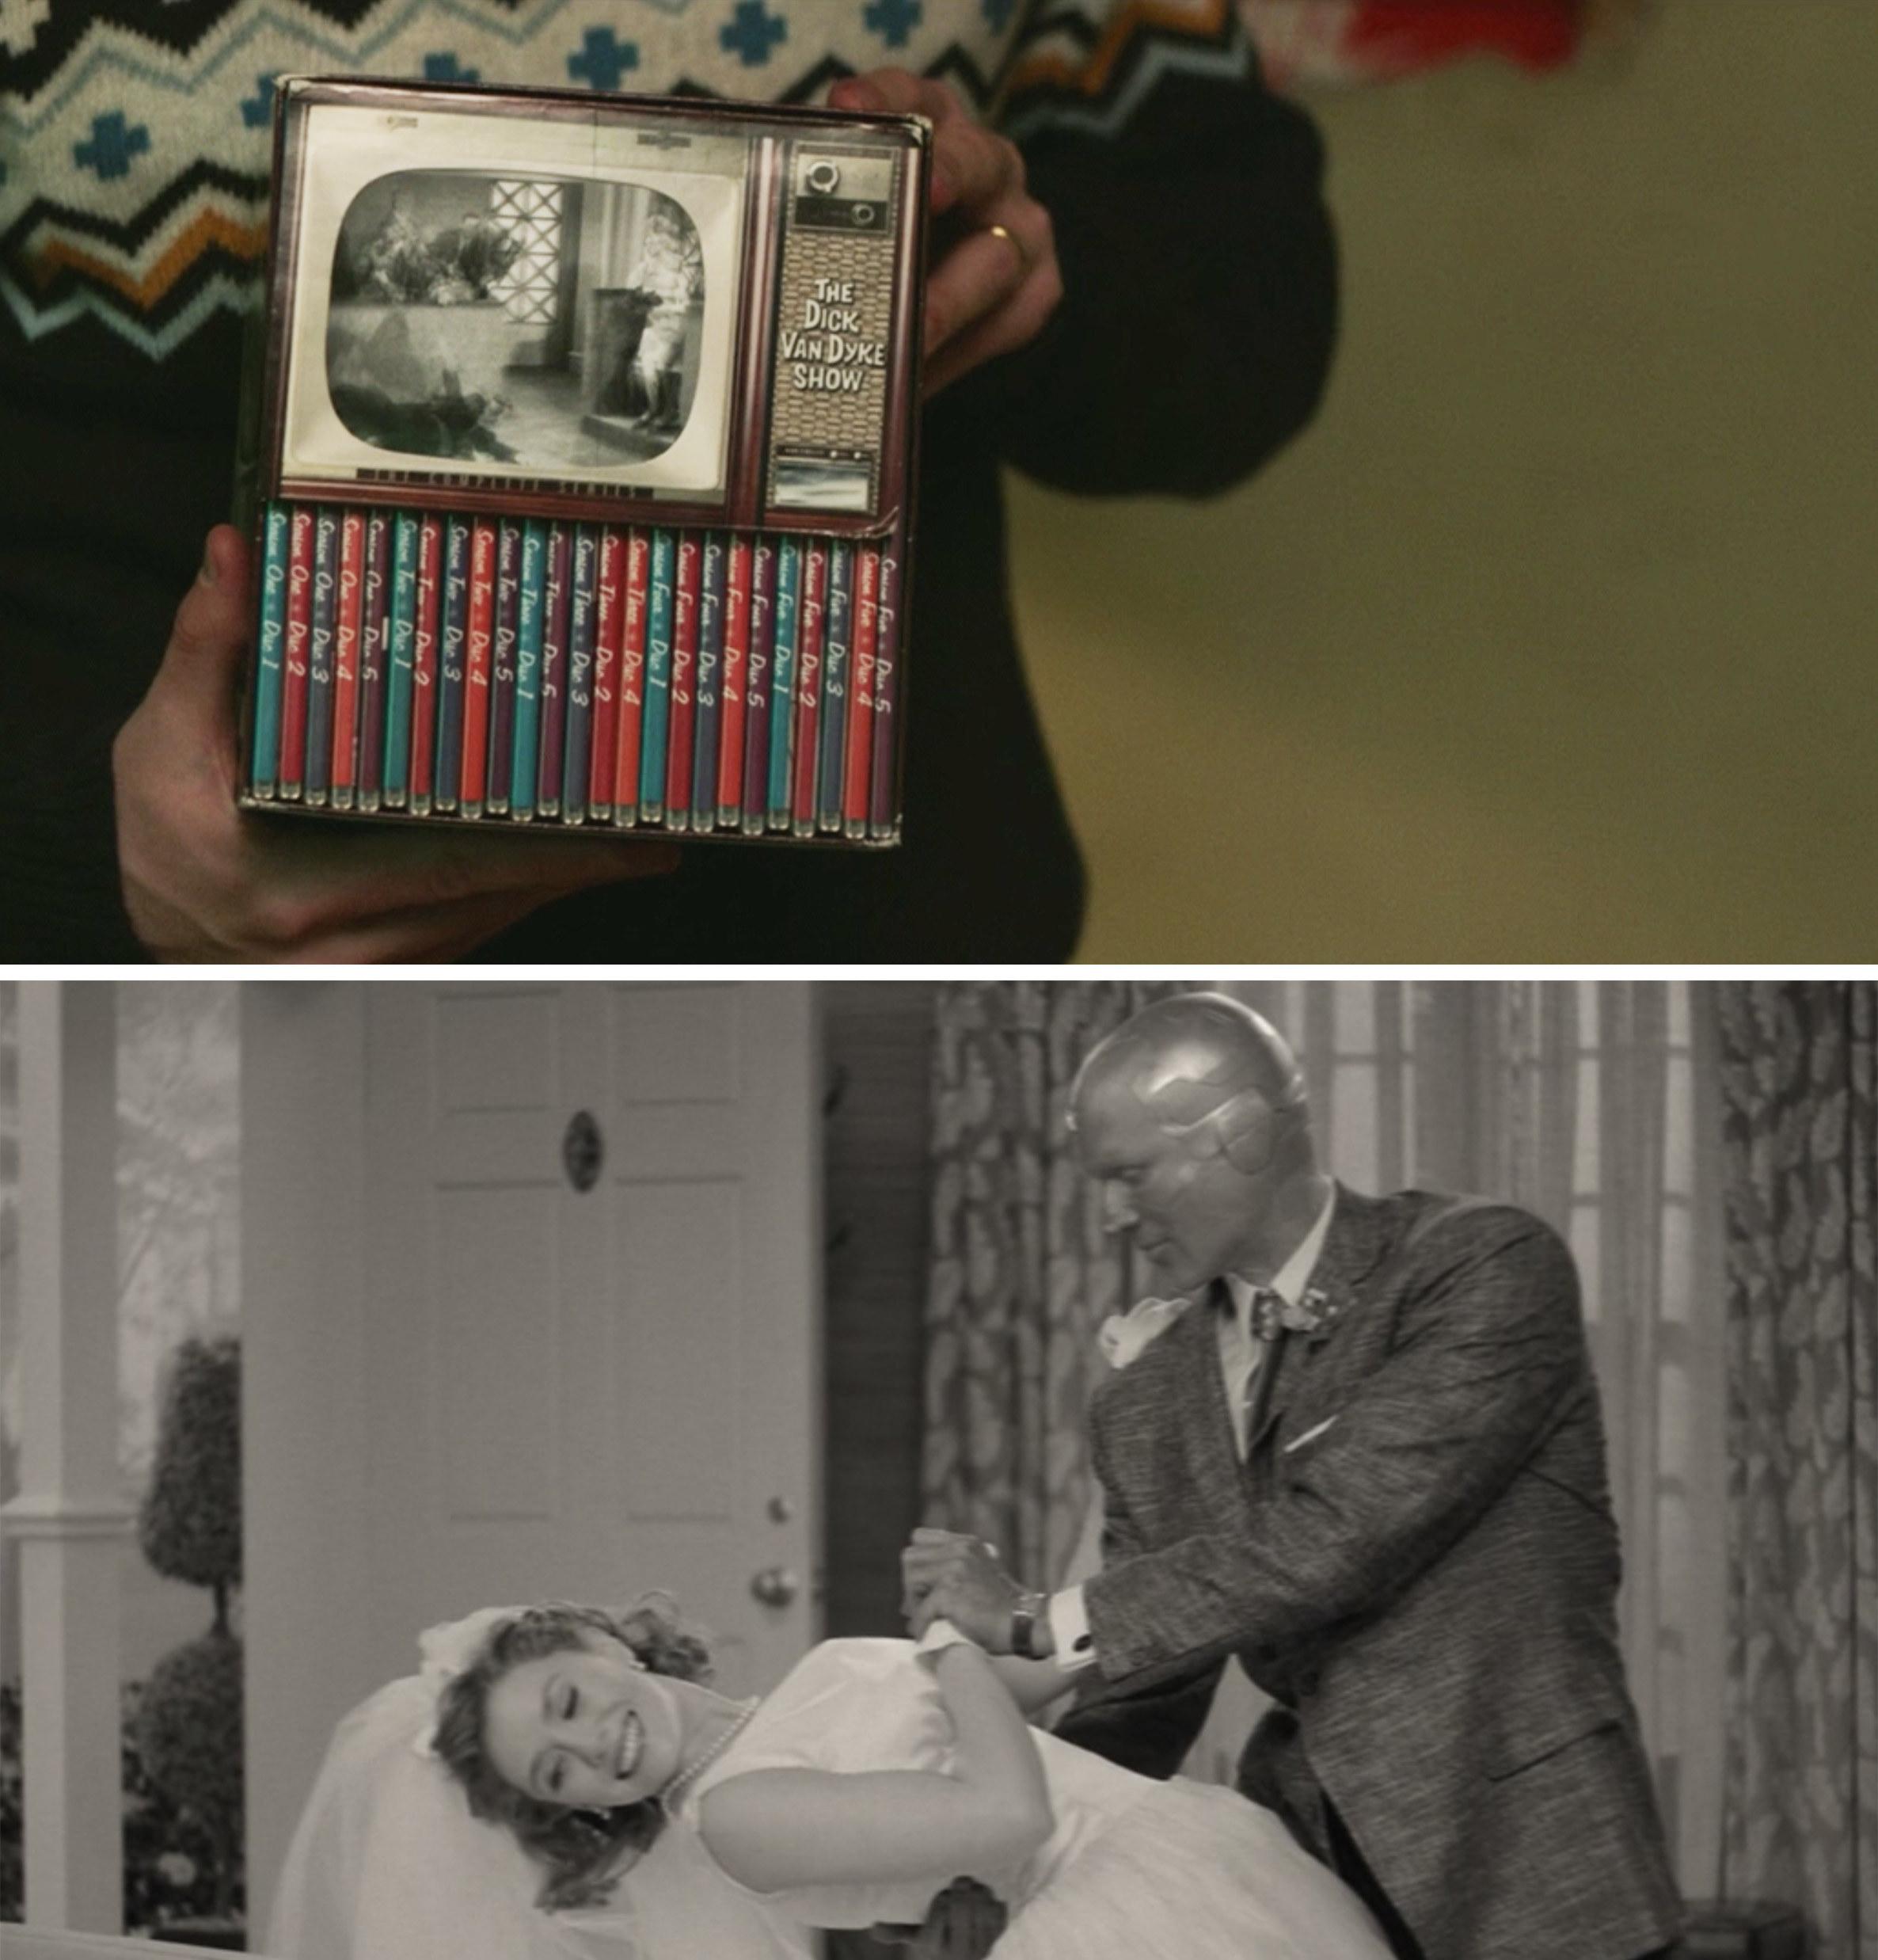 Wanda's dad holding Dick Van Dyke DVDs and Wanda and Vision dancing in Episode 1